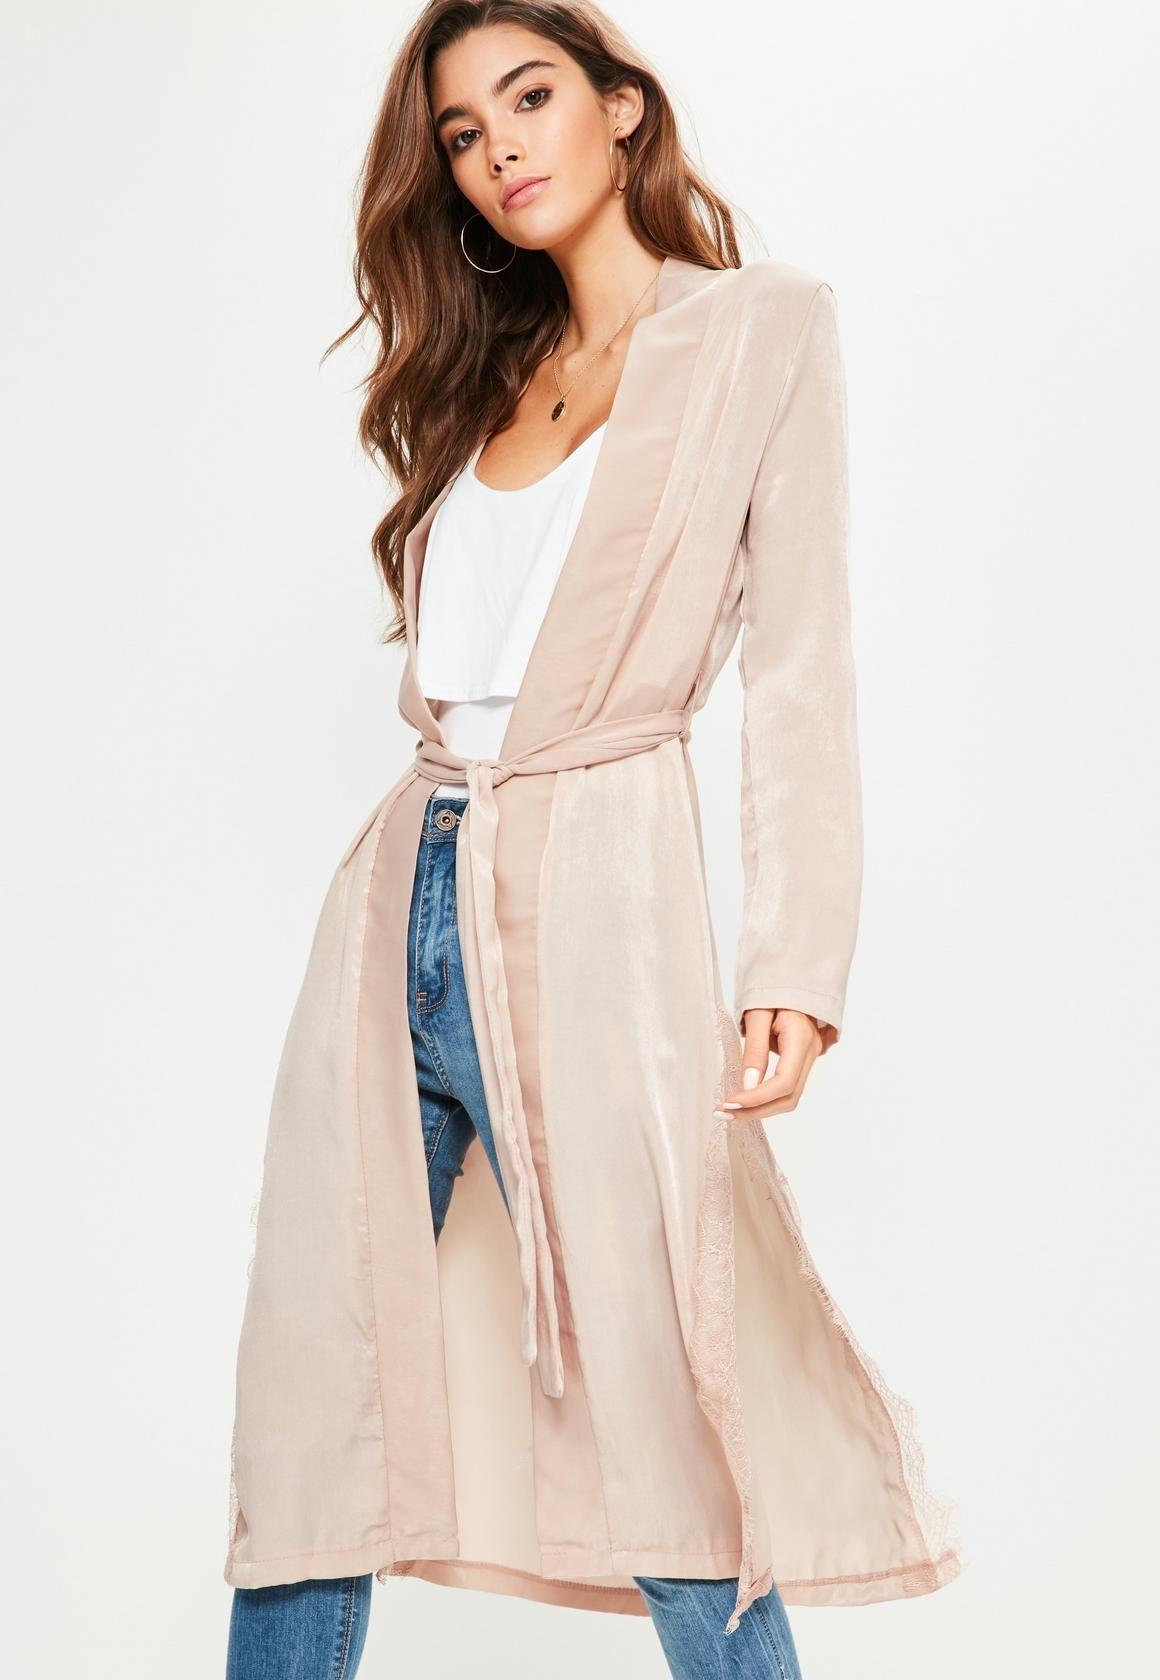 Missguided - Pink Satin Lace Applique Side Kimono Jacket | Fashion ...